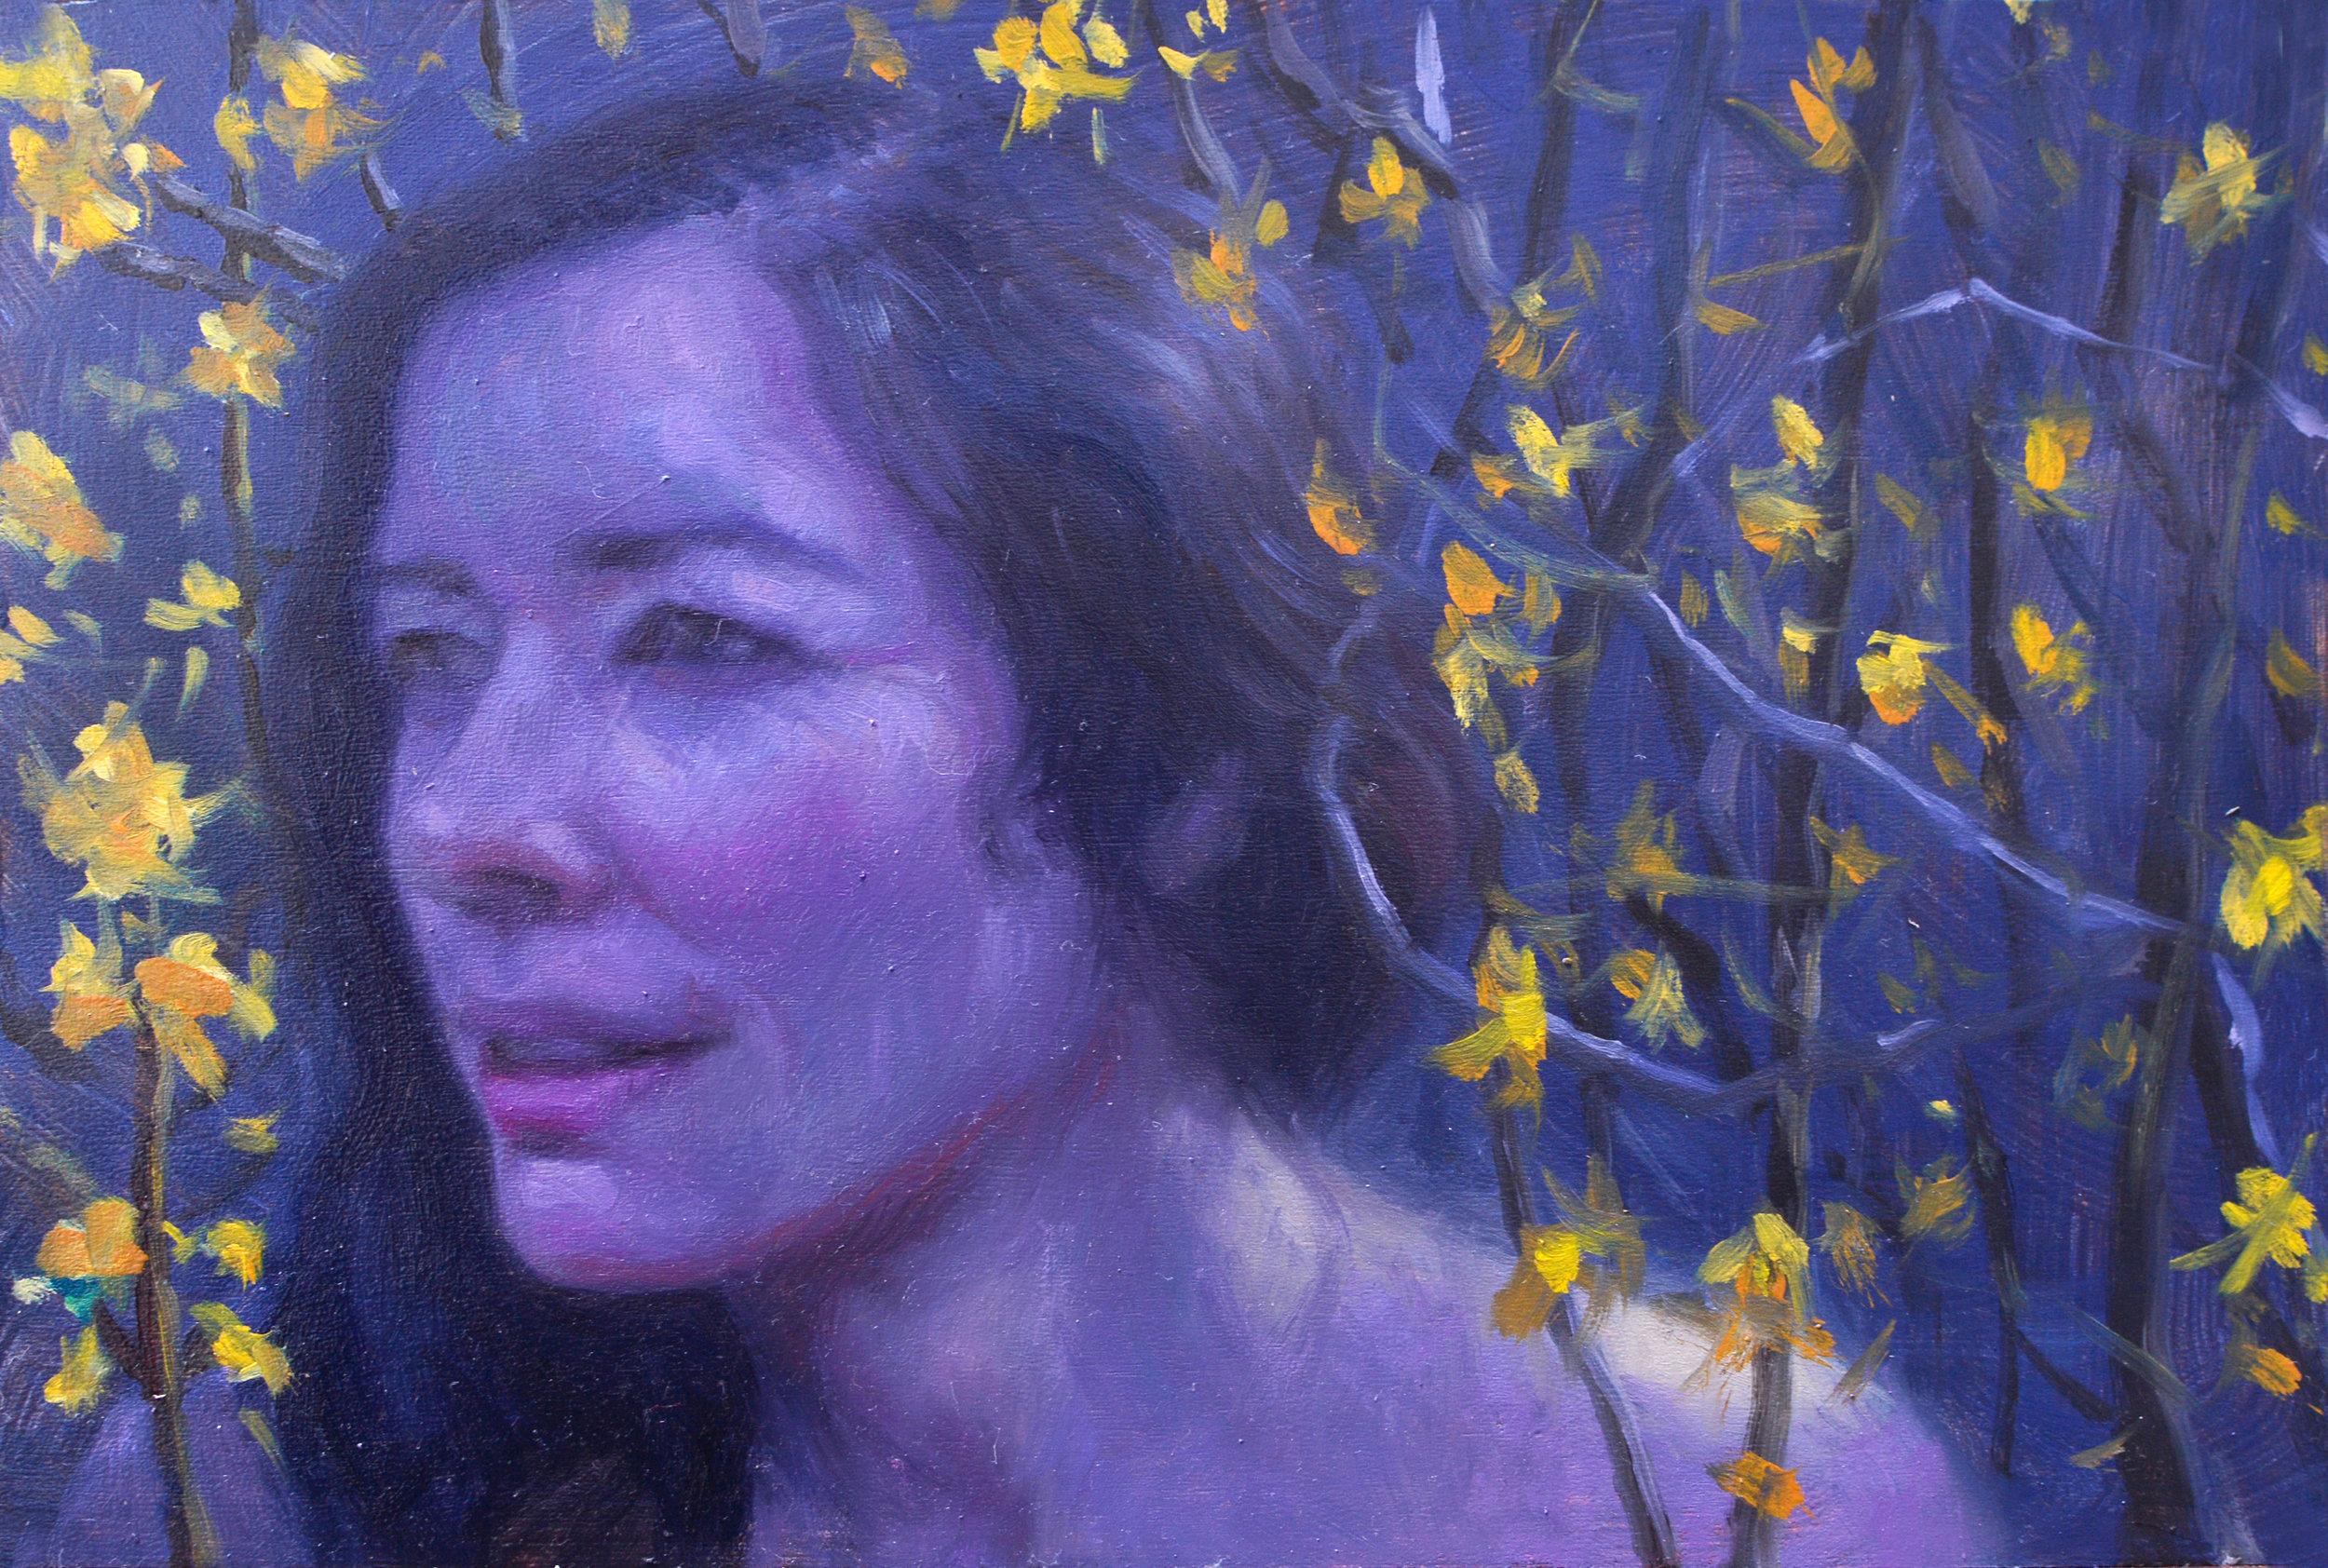 Francien Krieg Blossom oil on panel 12 x 8 inch 2019.jpg